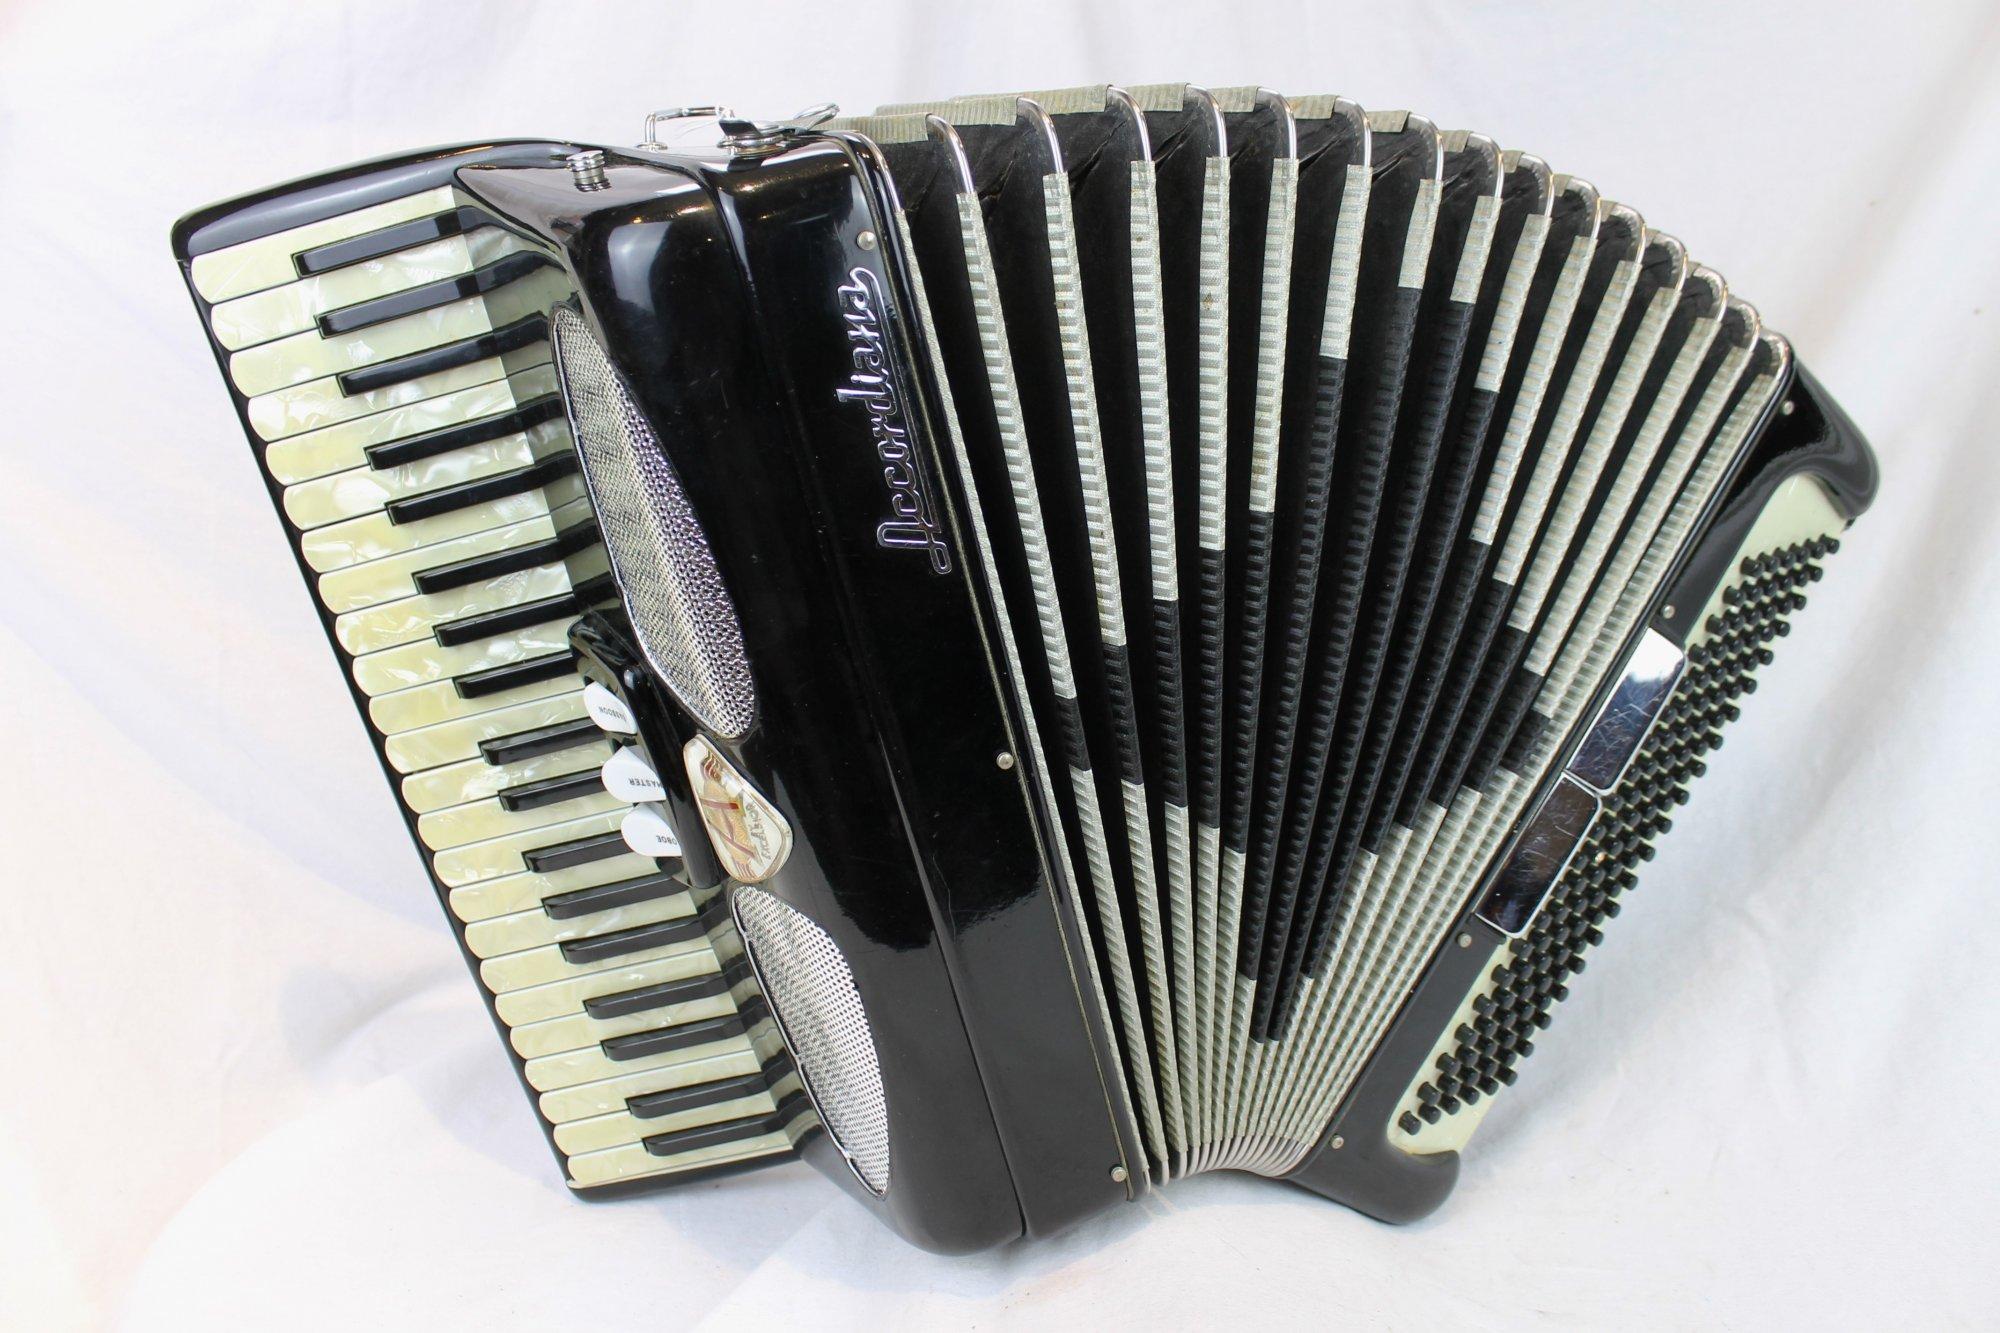 4230 - Black Excelsior Accordiana 305 Piano Accordion LM 41 120